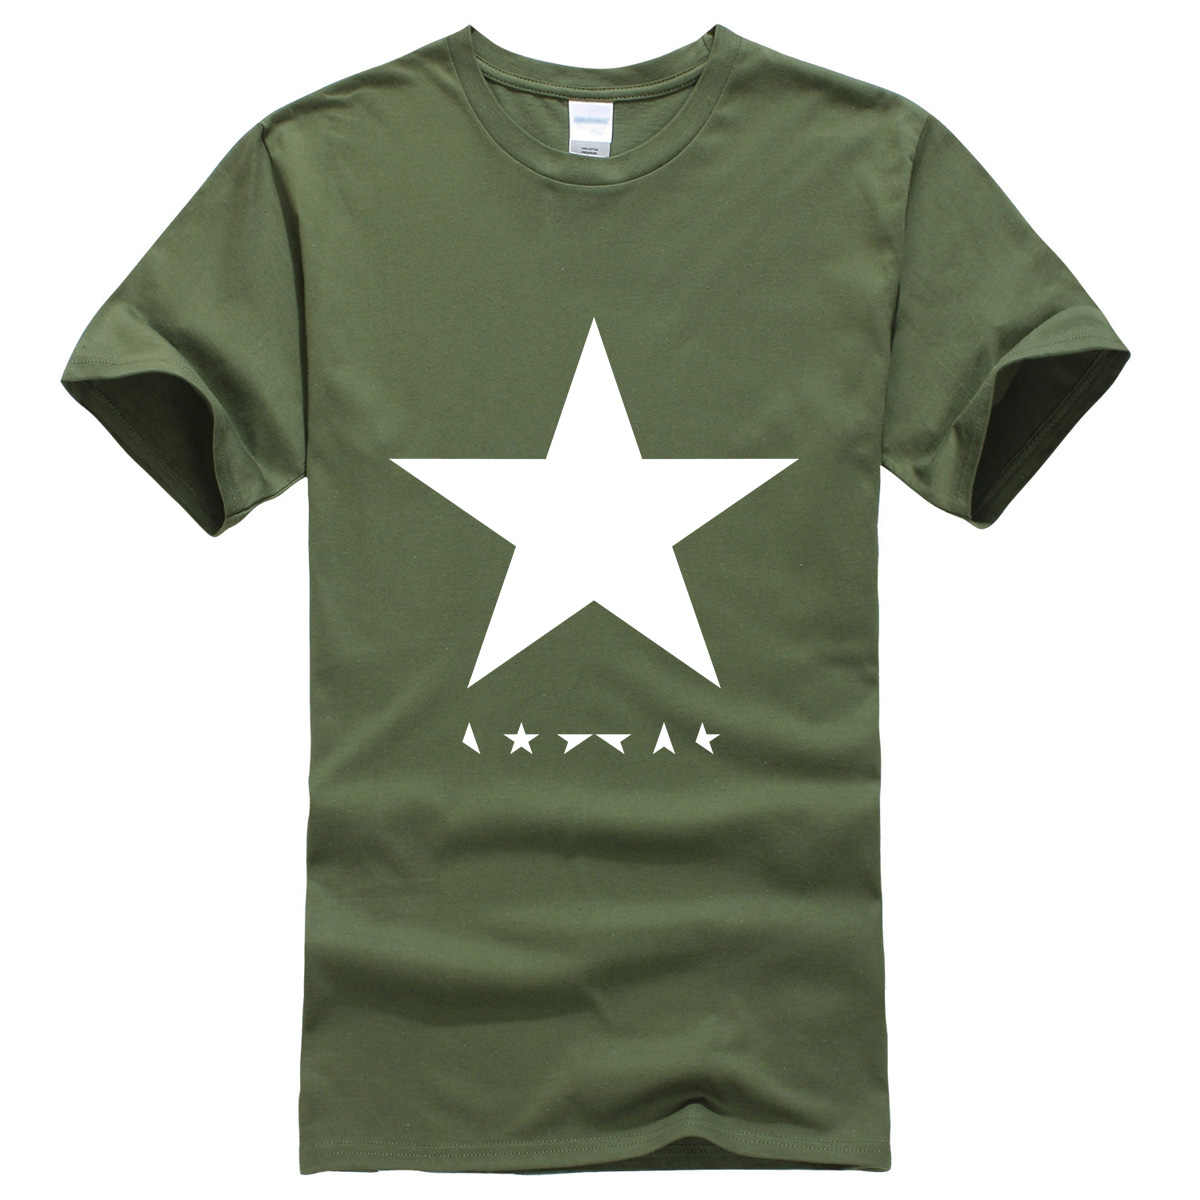 4b3aed7da ... Hot summer 2019 men's T-shirts David Bowie heroes black star logo  fashion T- ...